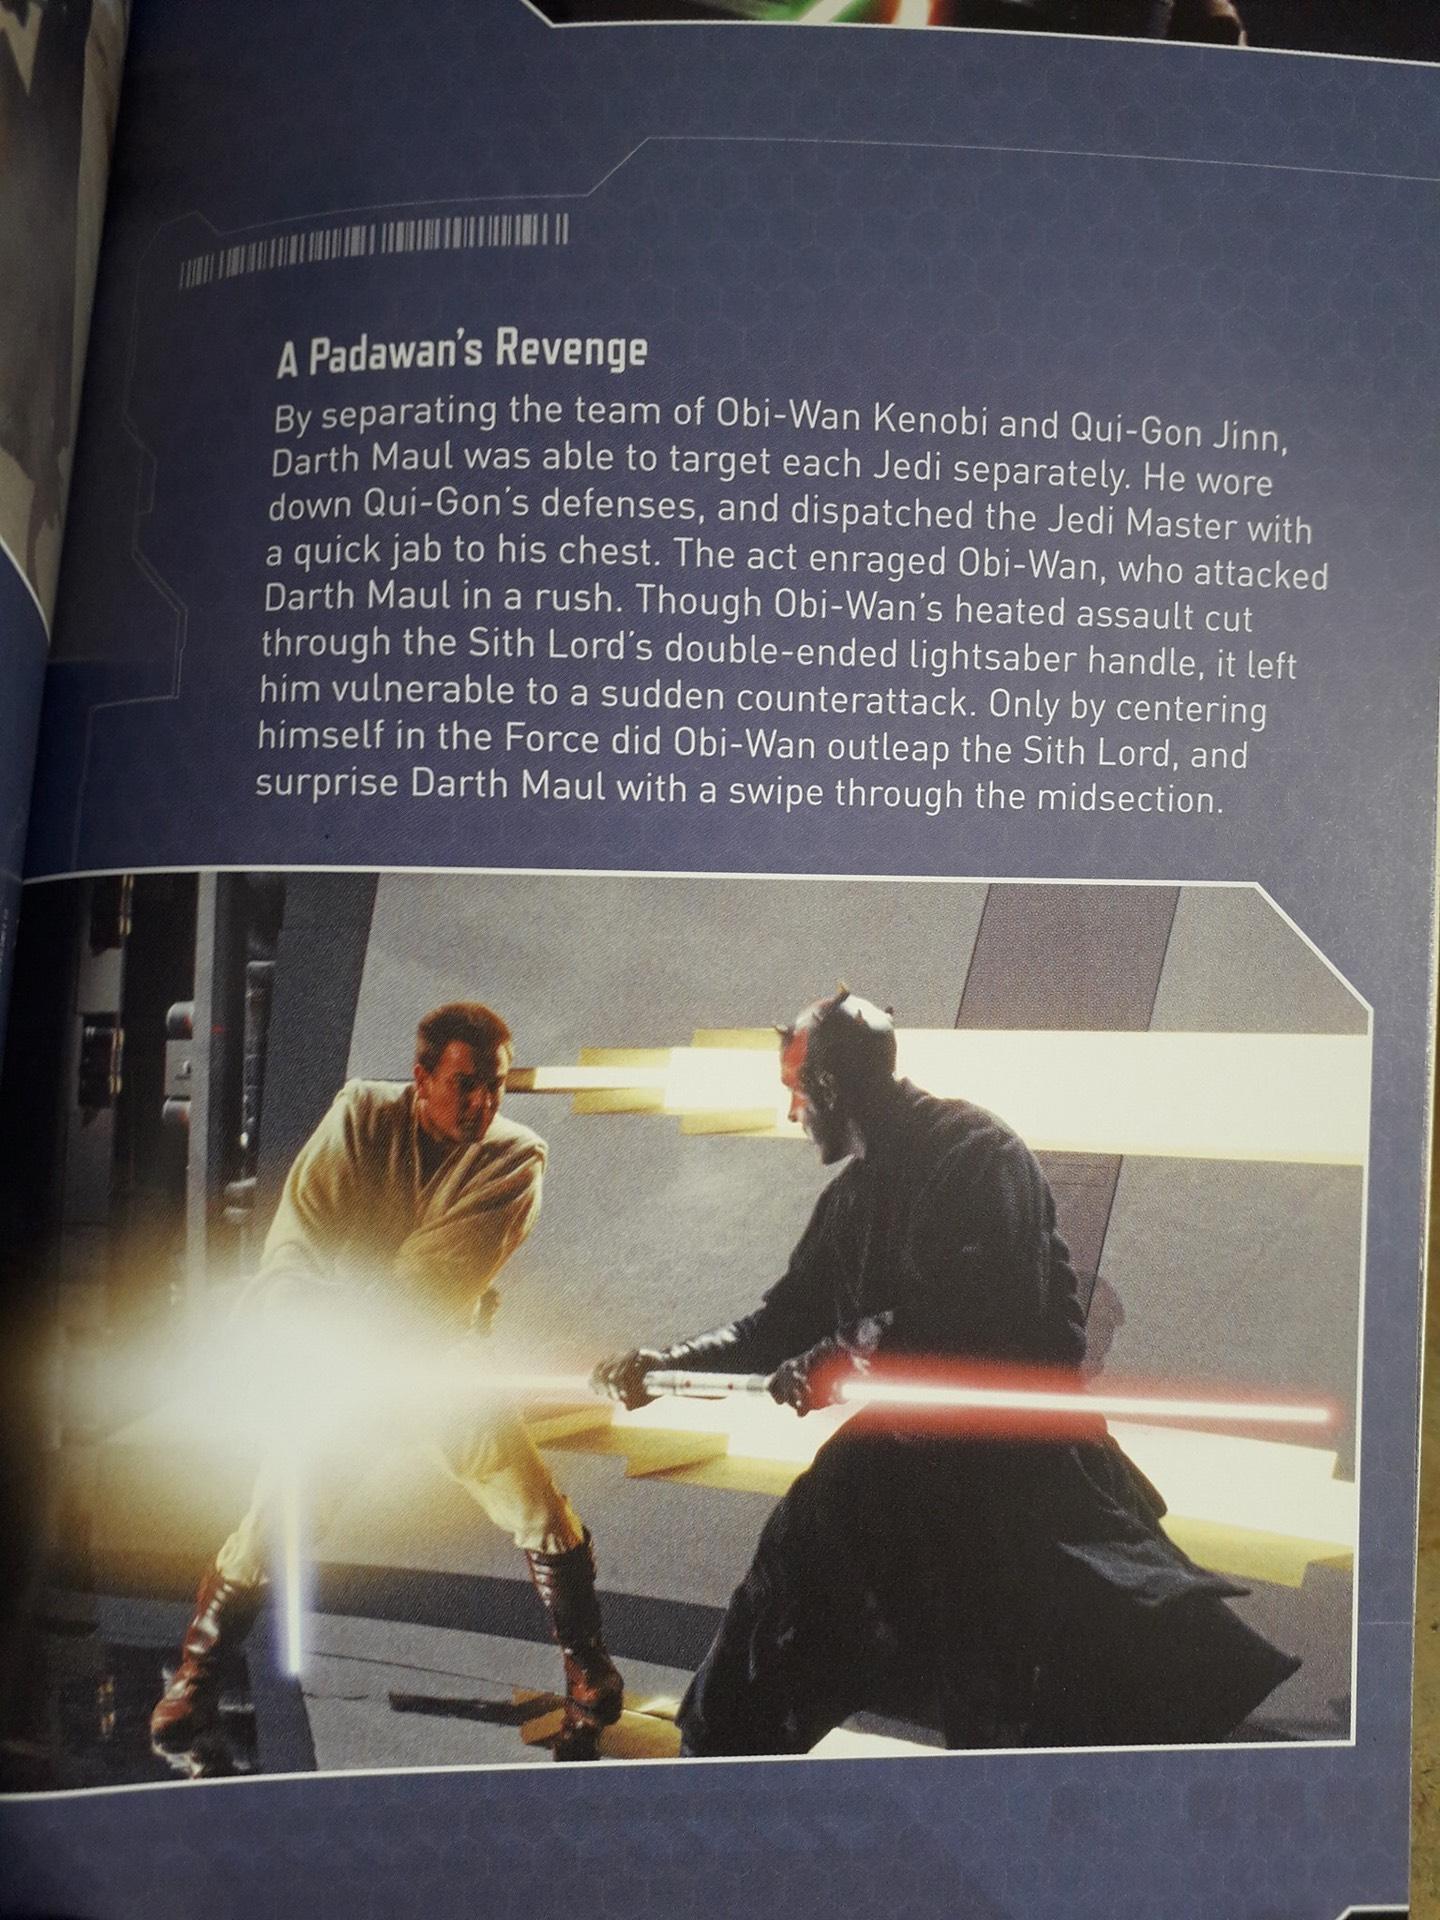 ANH Vader vs TPM Kenobi  - Page 5 2020-03-26